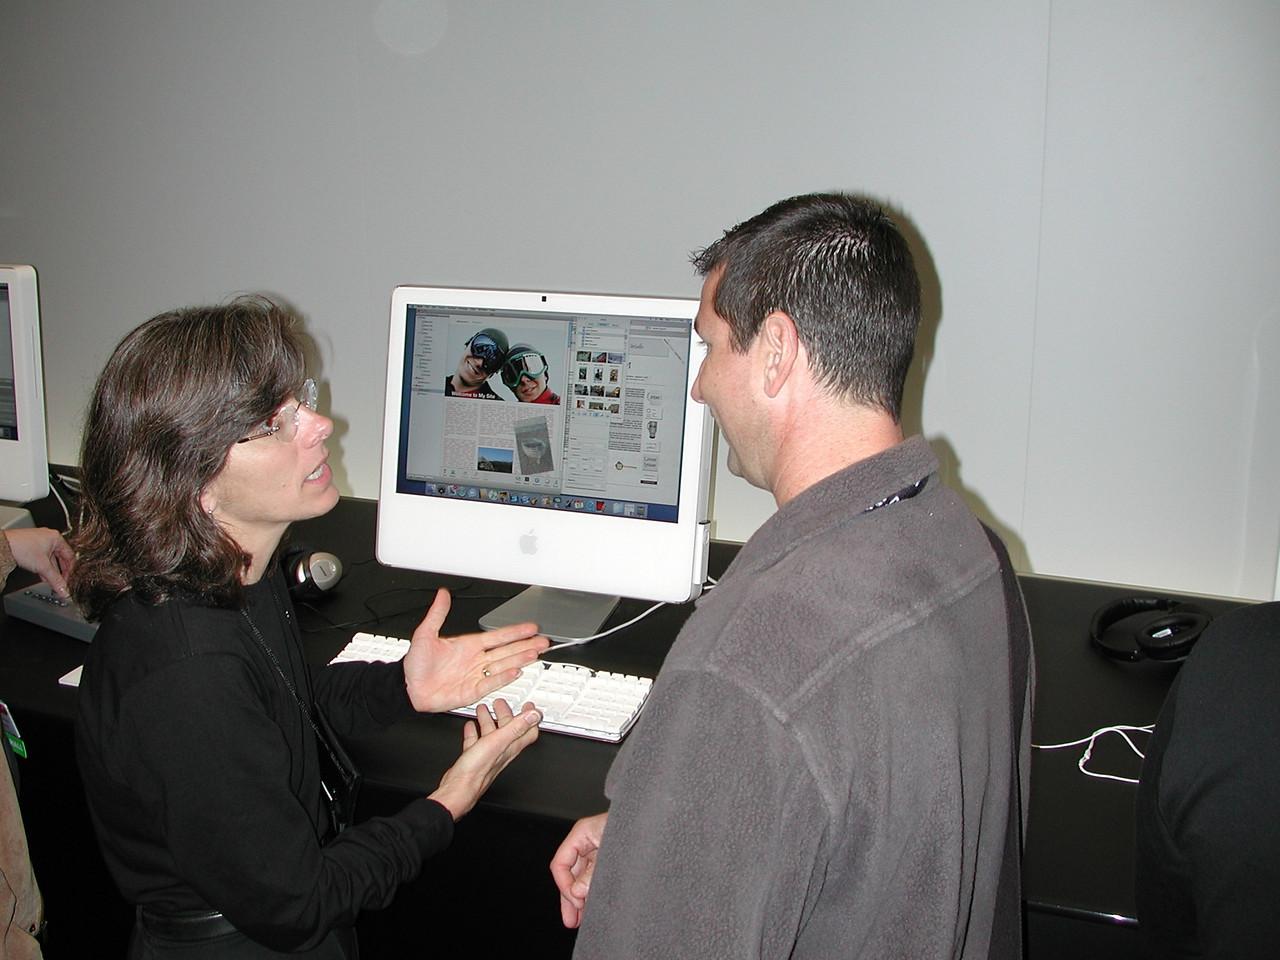 iNtel iMac